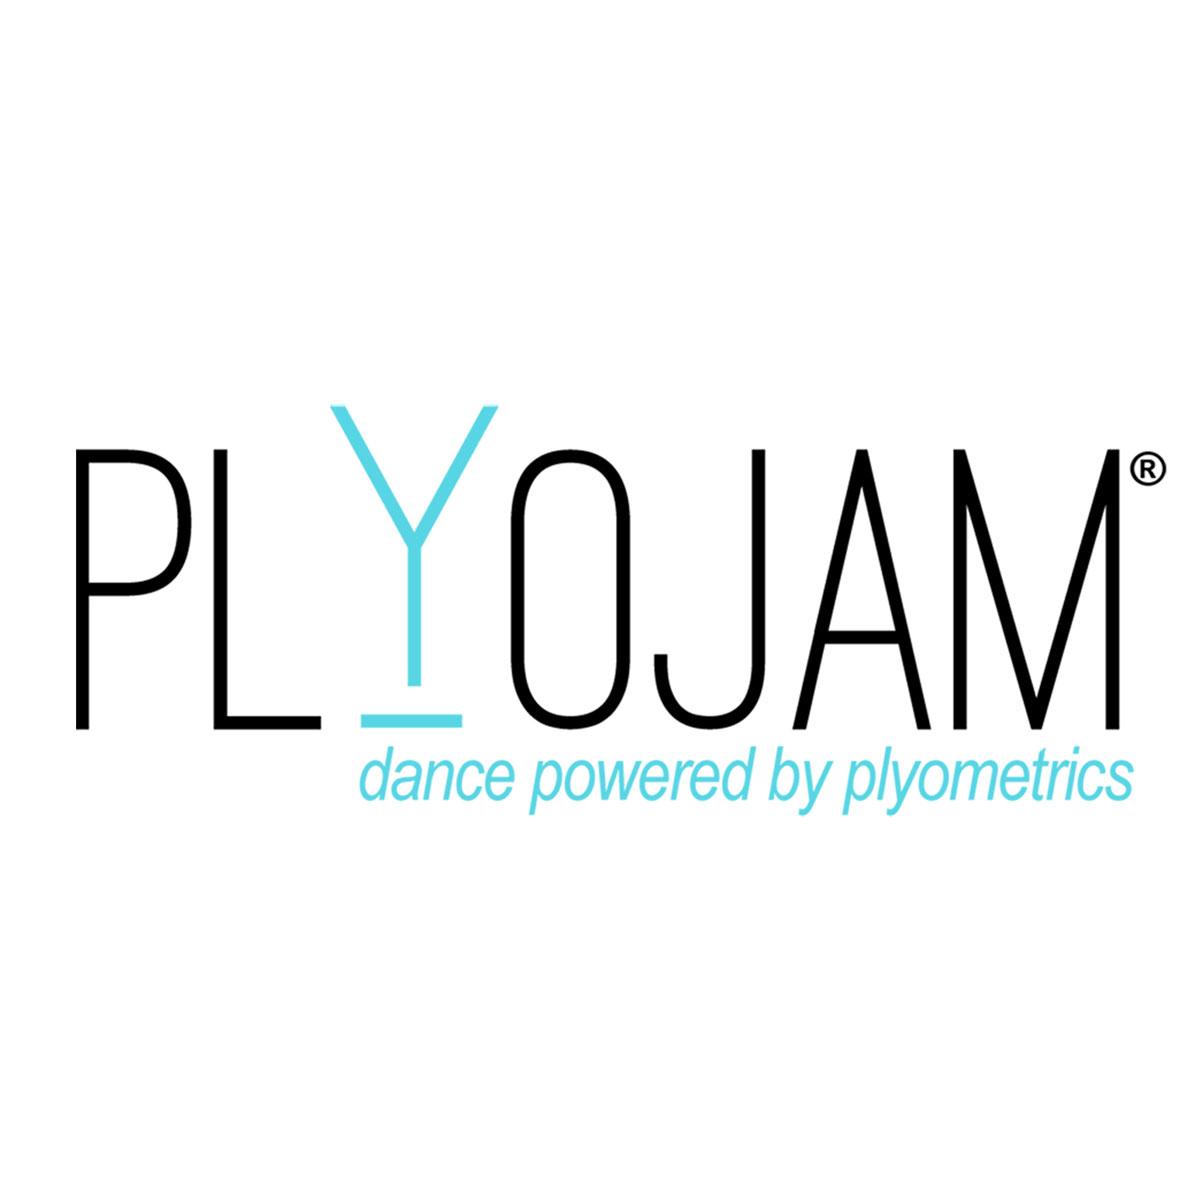 PlyoJam-Logo-Black-High-Res.jpg